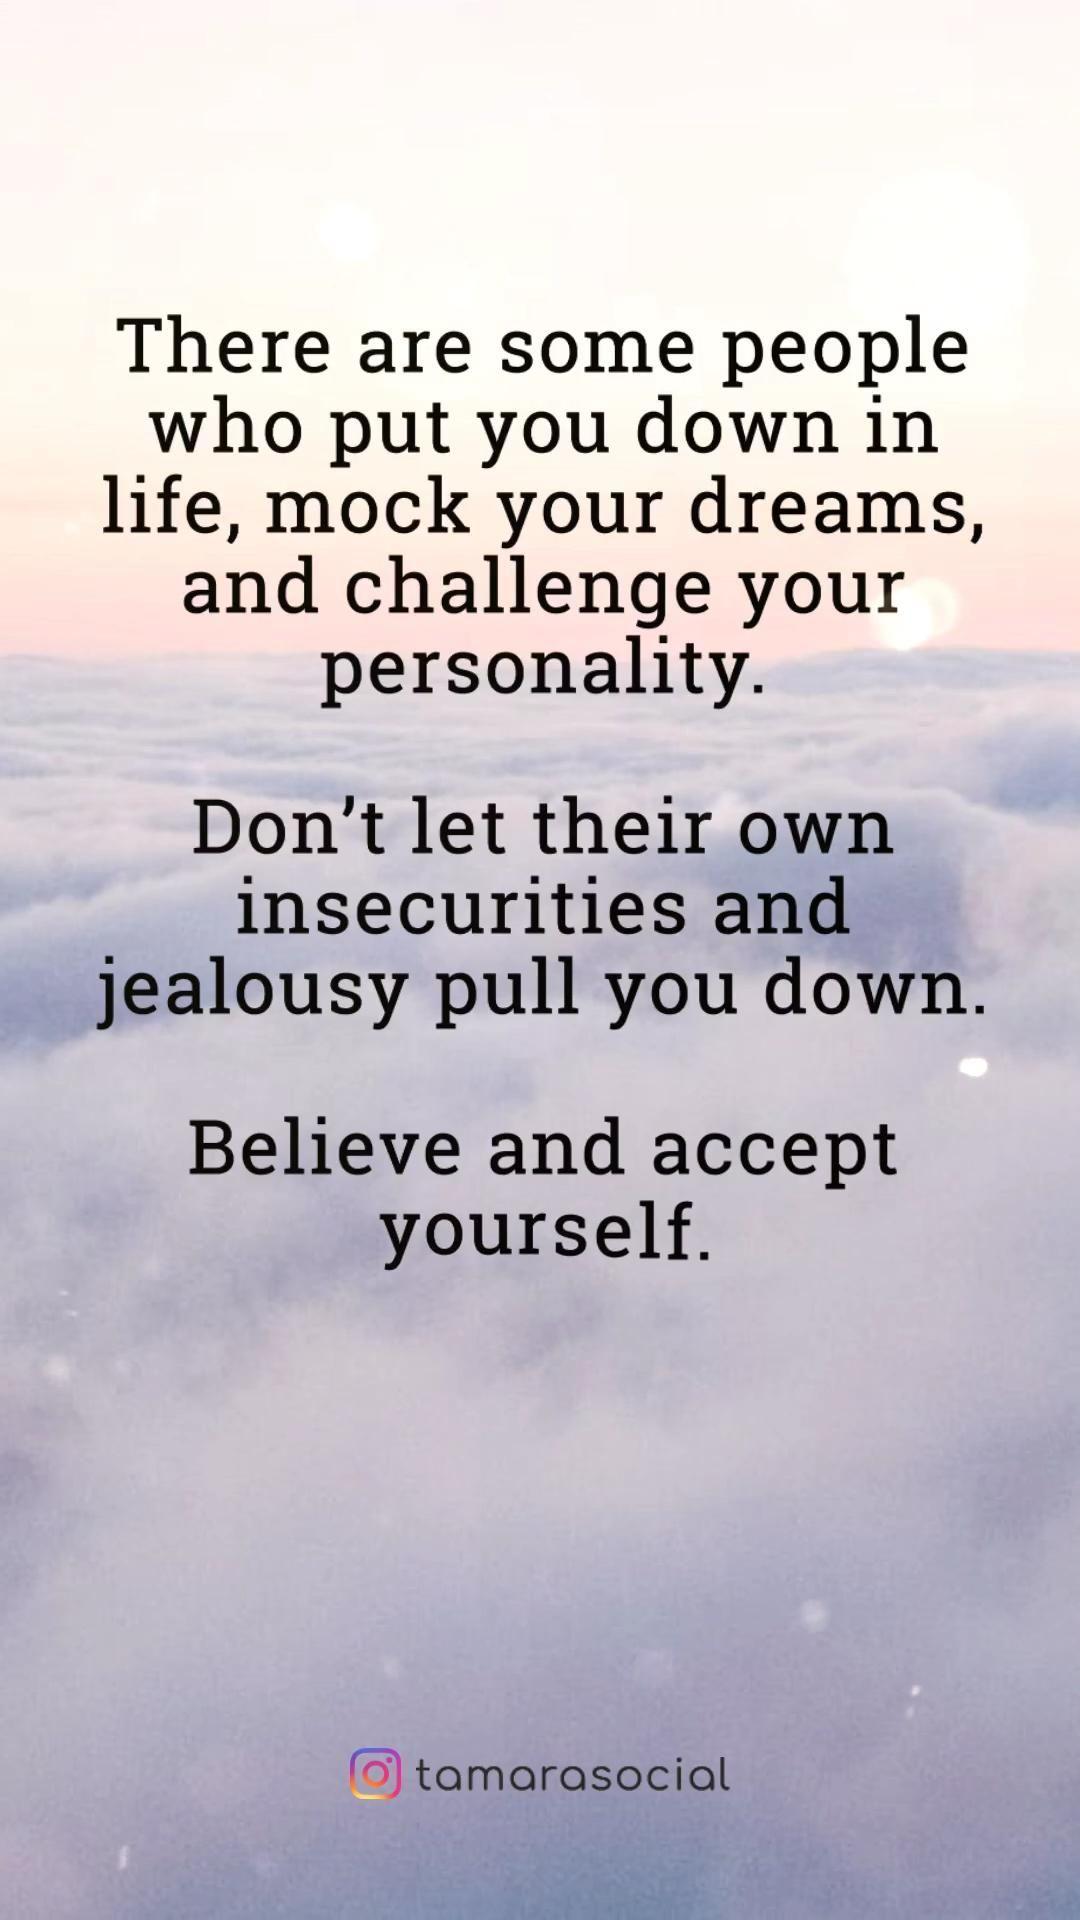 Believe in yourself.